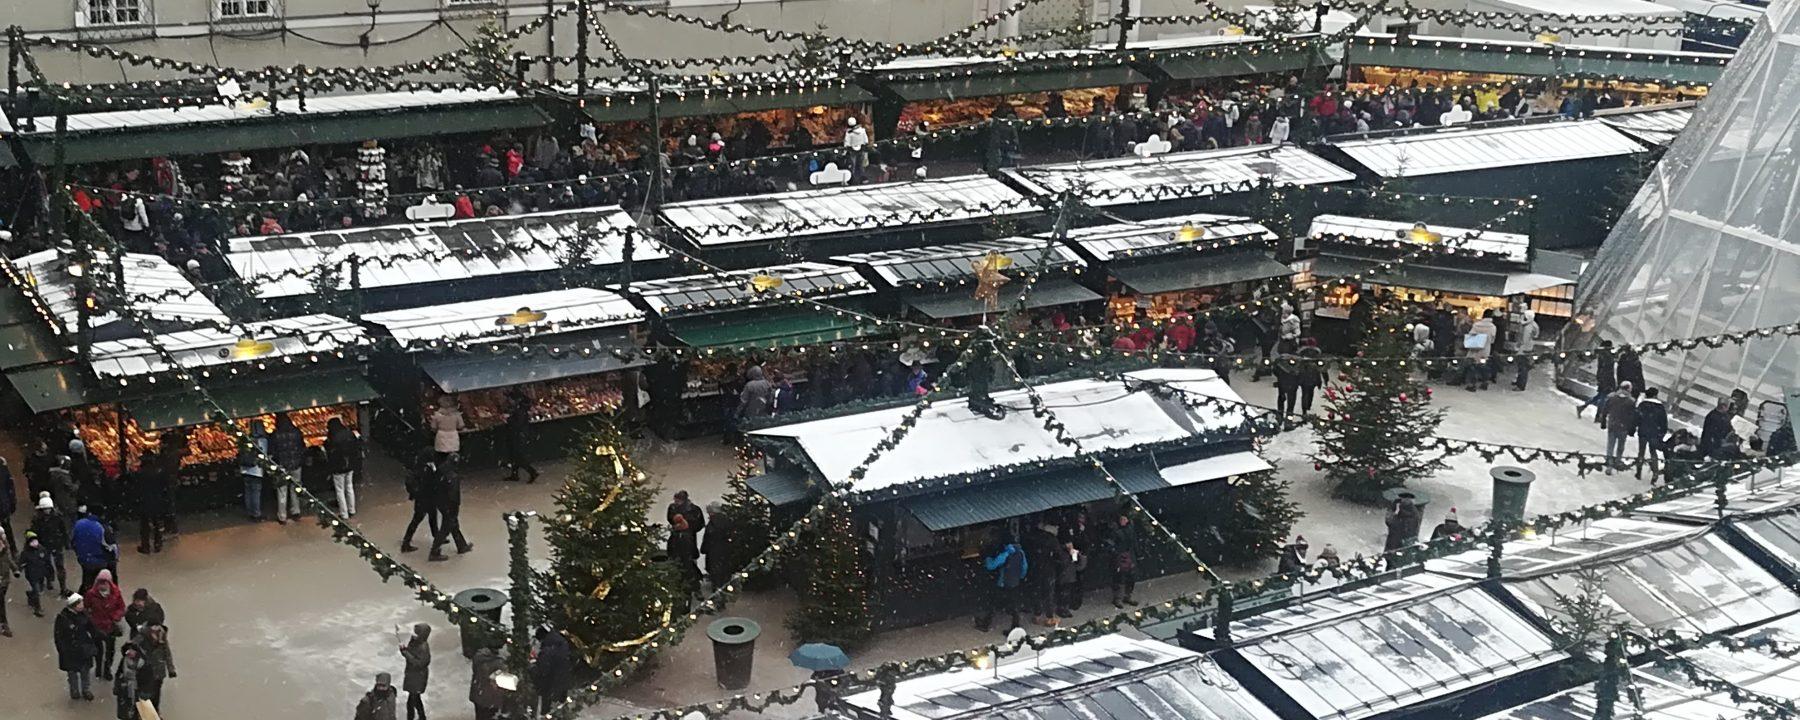 Julemarked i Salzburg